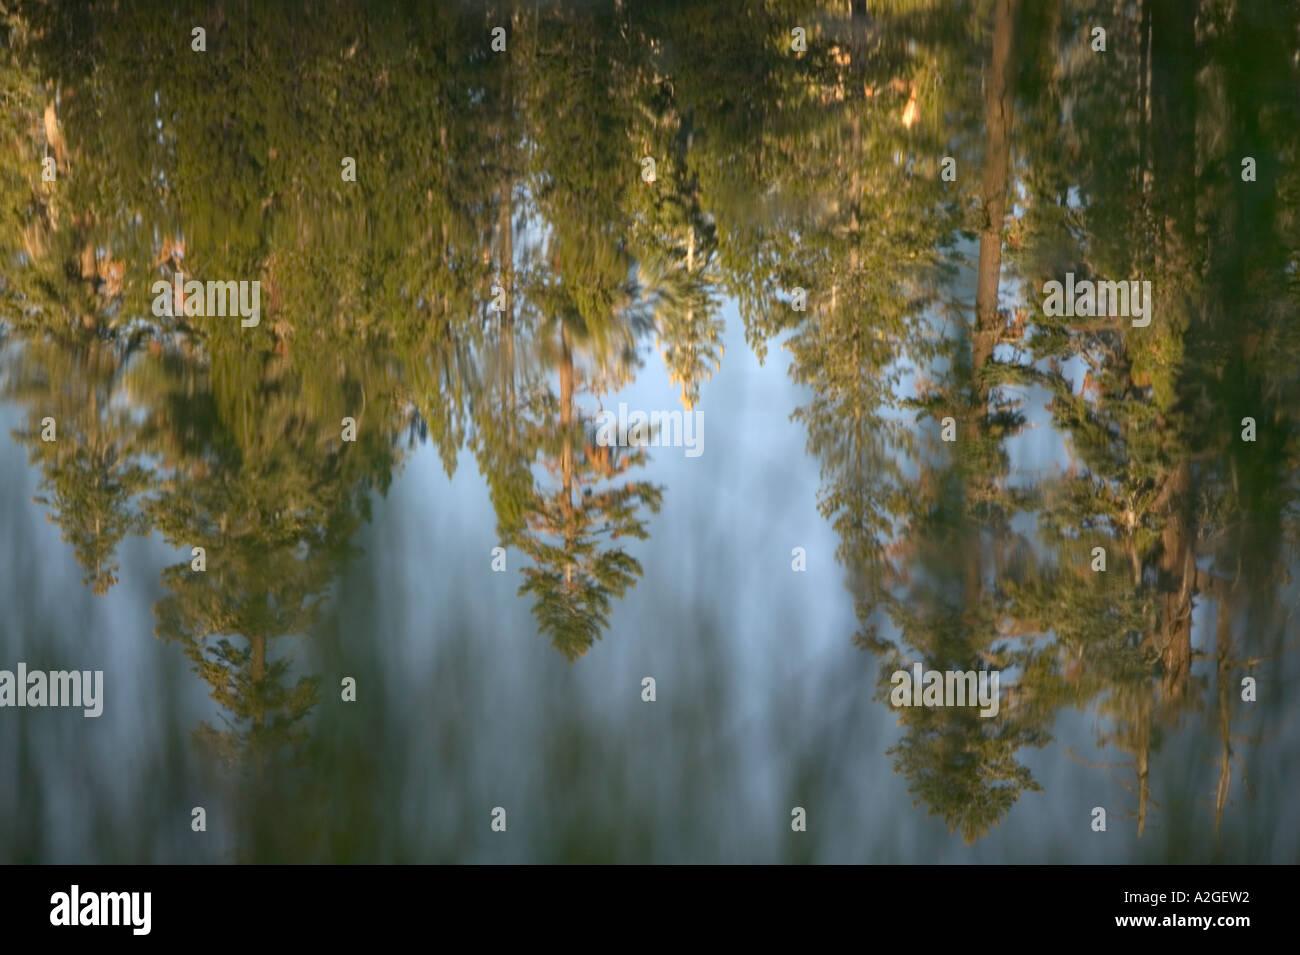 USA, California, Yosemite National Park: Siesta Lake (off Tioga Road) Morning Light, Grasses & Reflections Stock Photo